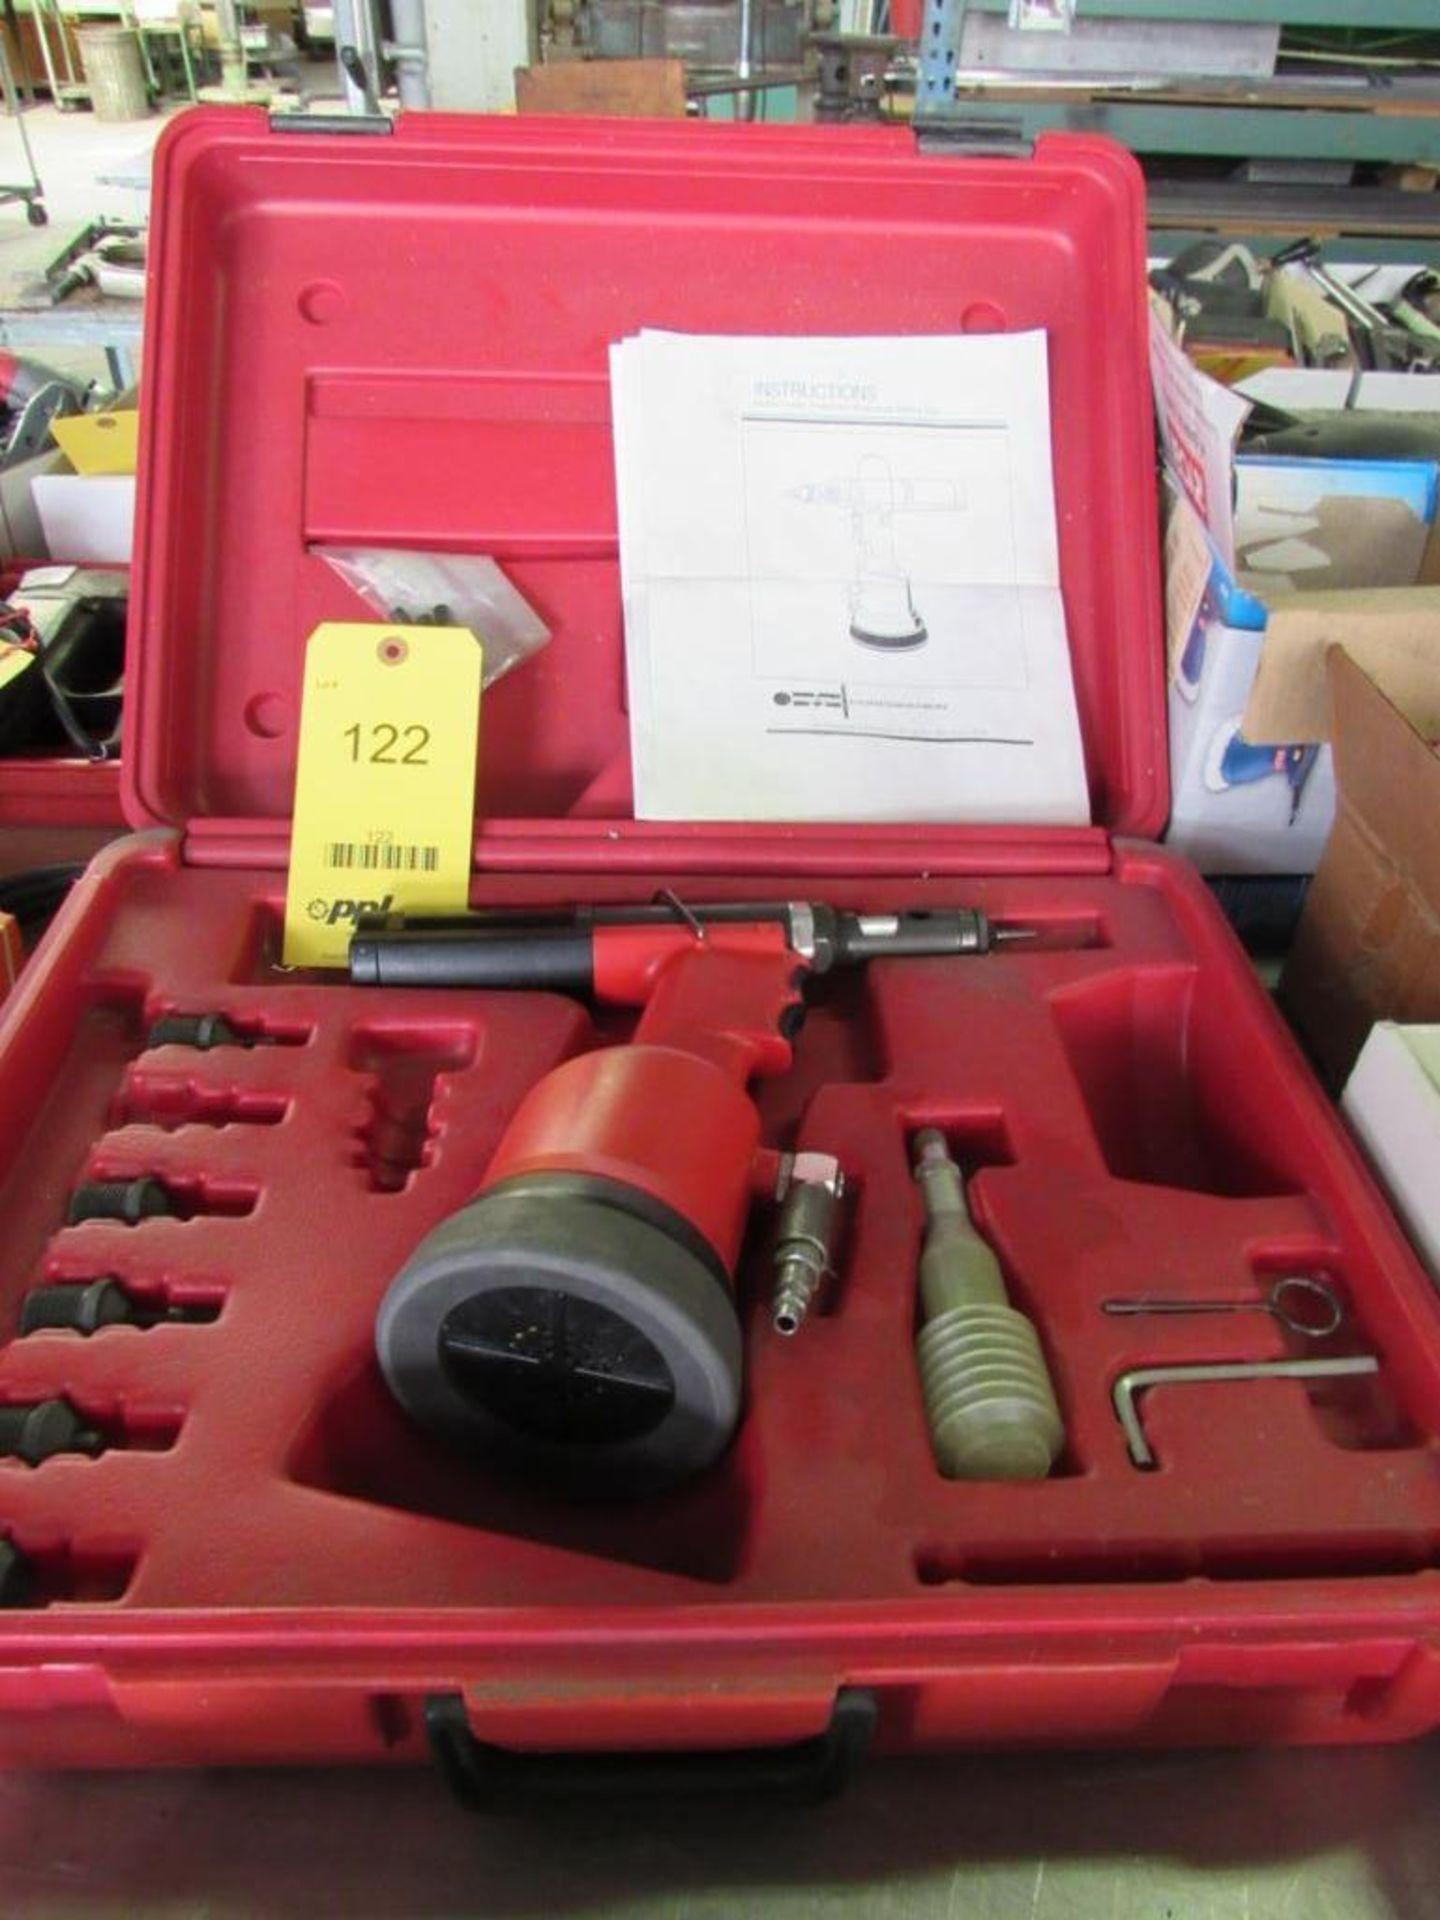 Lot 122 - Marson Pneumatic Rivet Nut Setting Tool Model 140SP, with Case